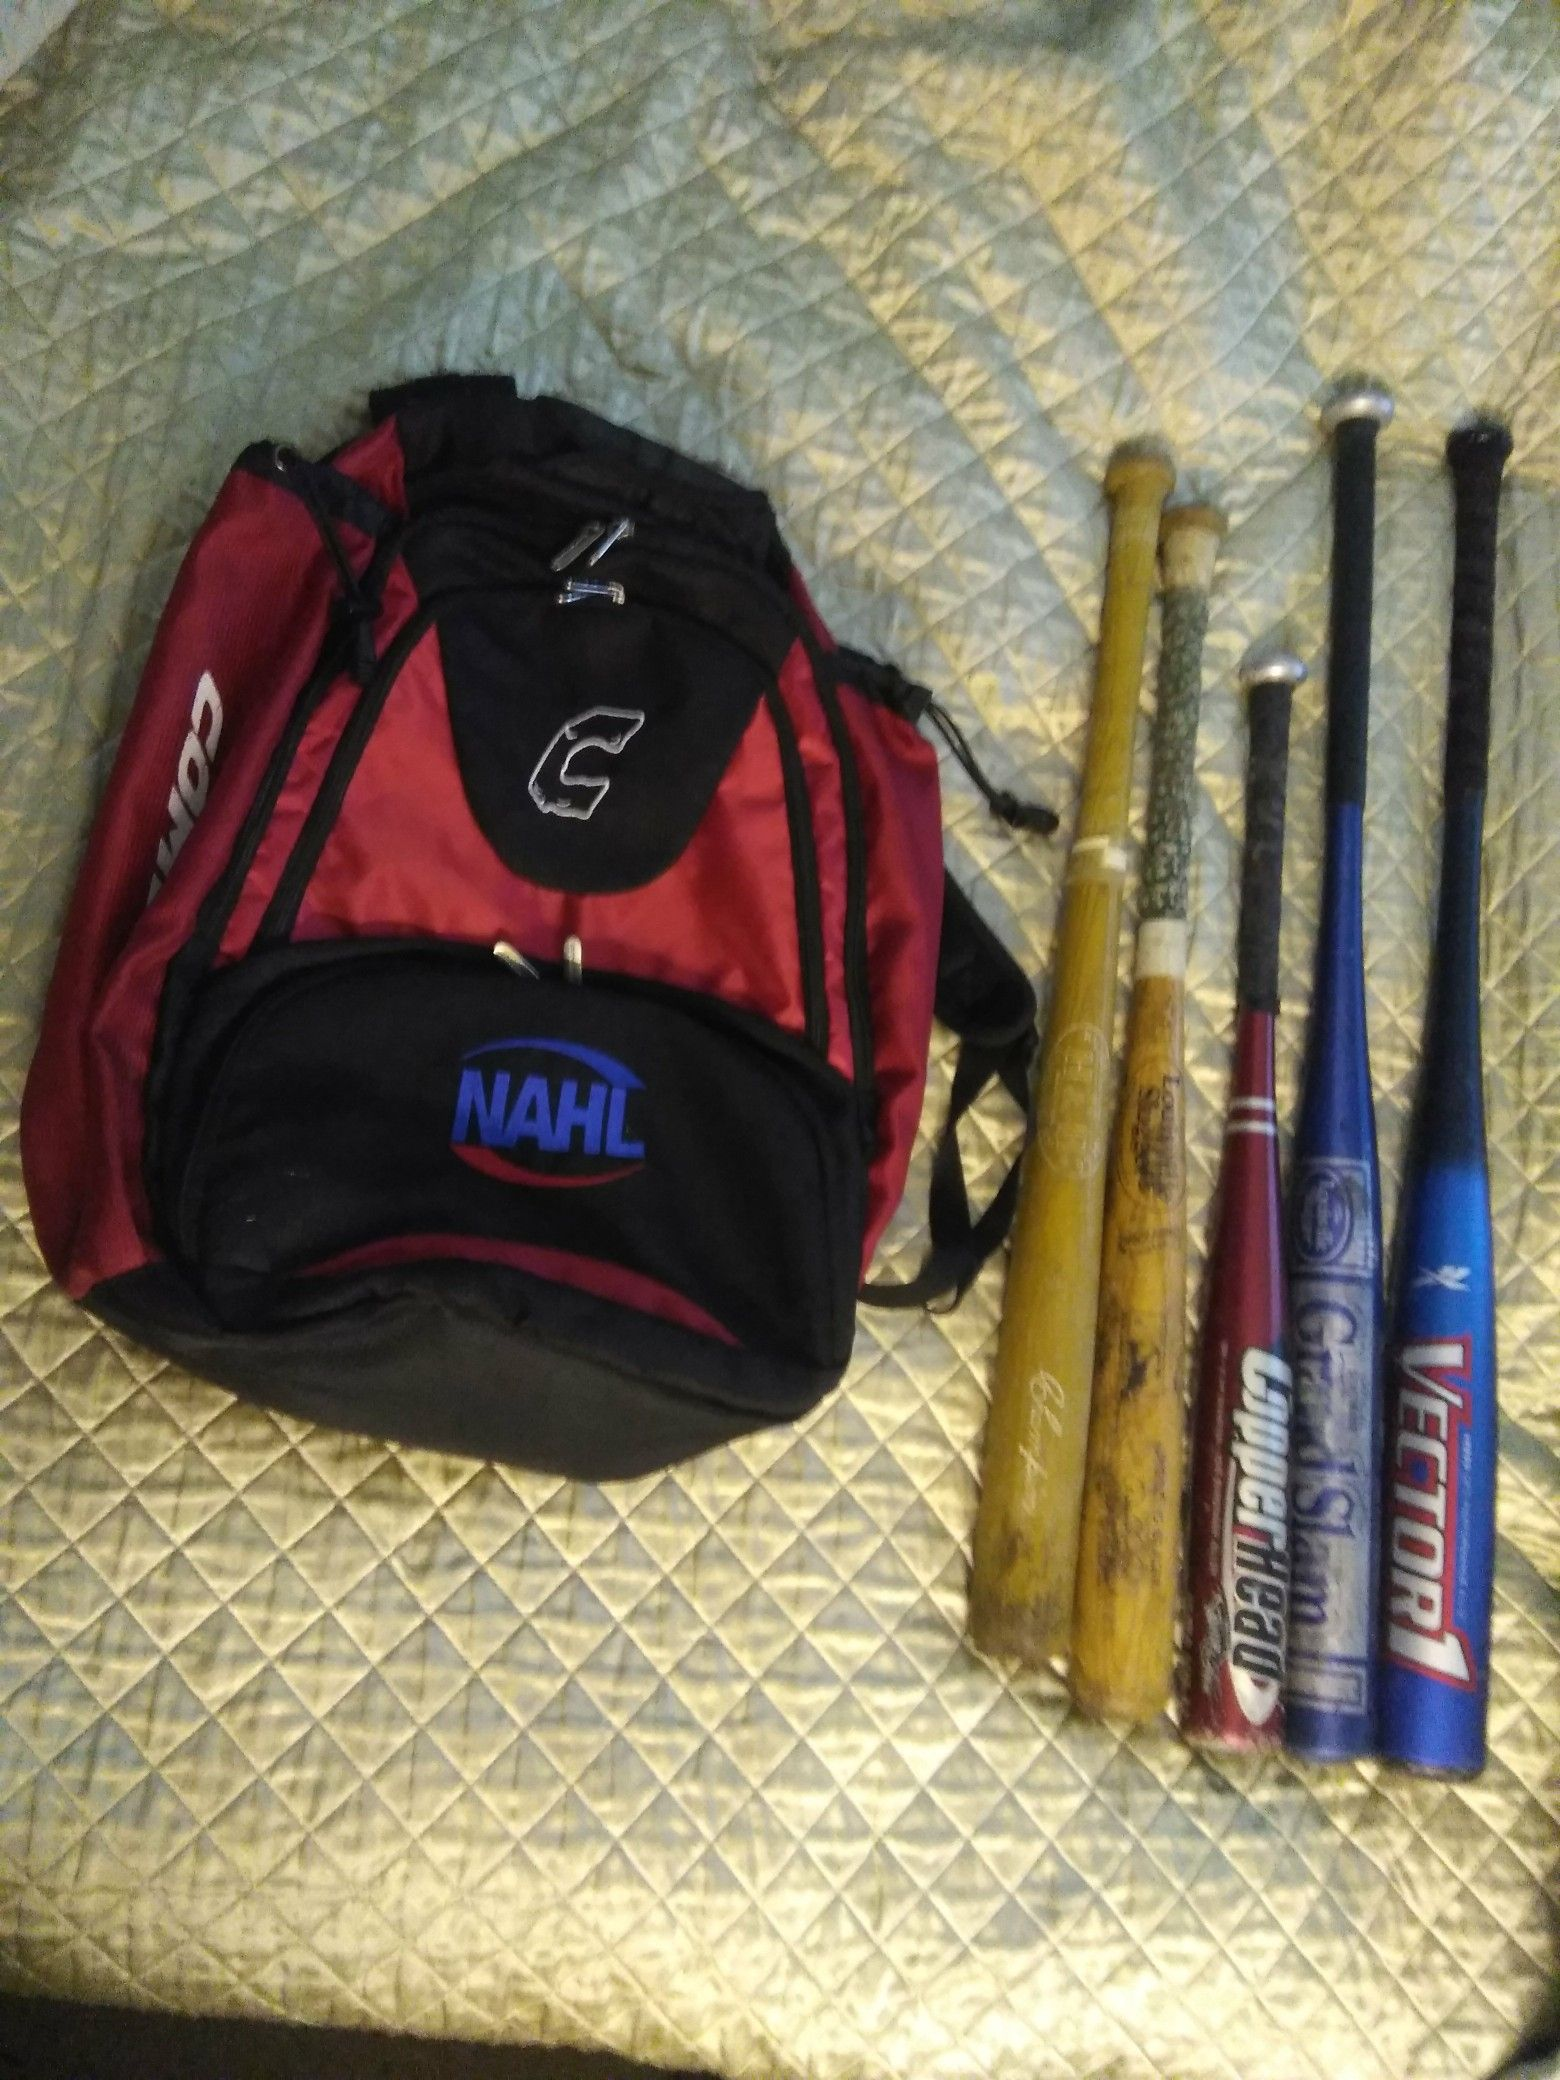 BASEBALL SOFTBALL BACKPACK BAG AND BATS. READ DETAILS